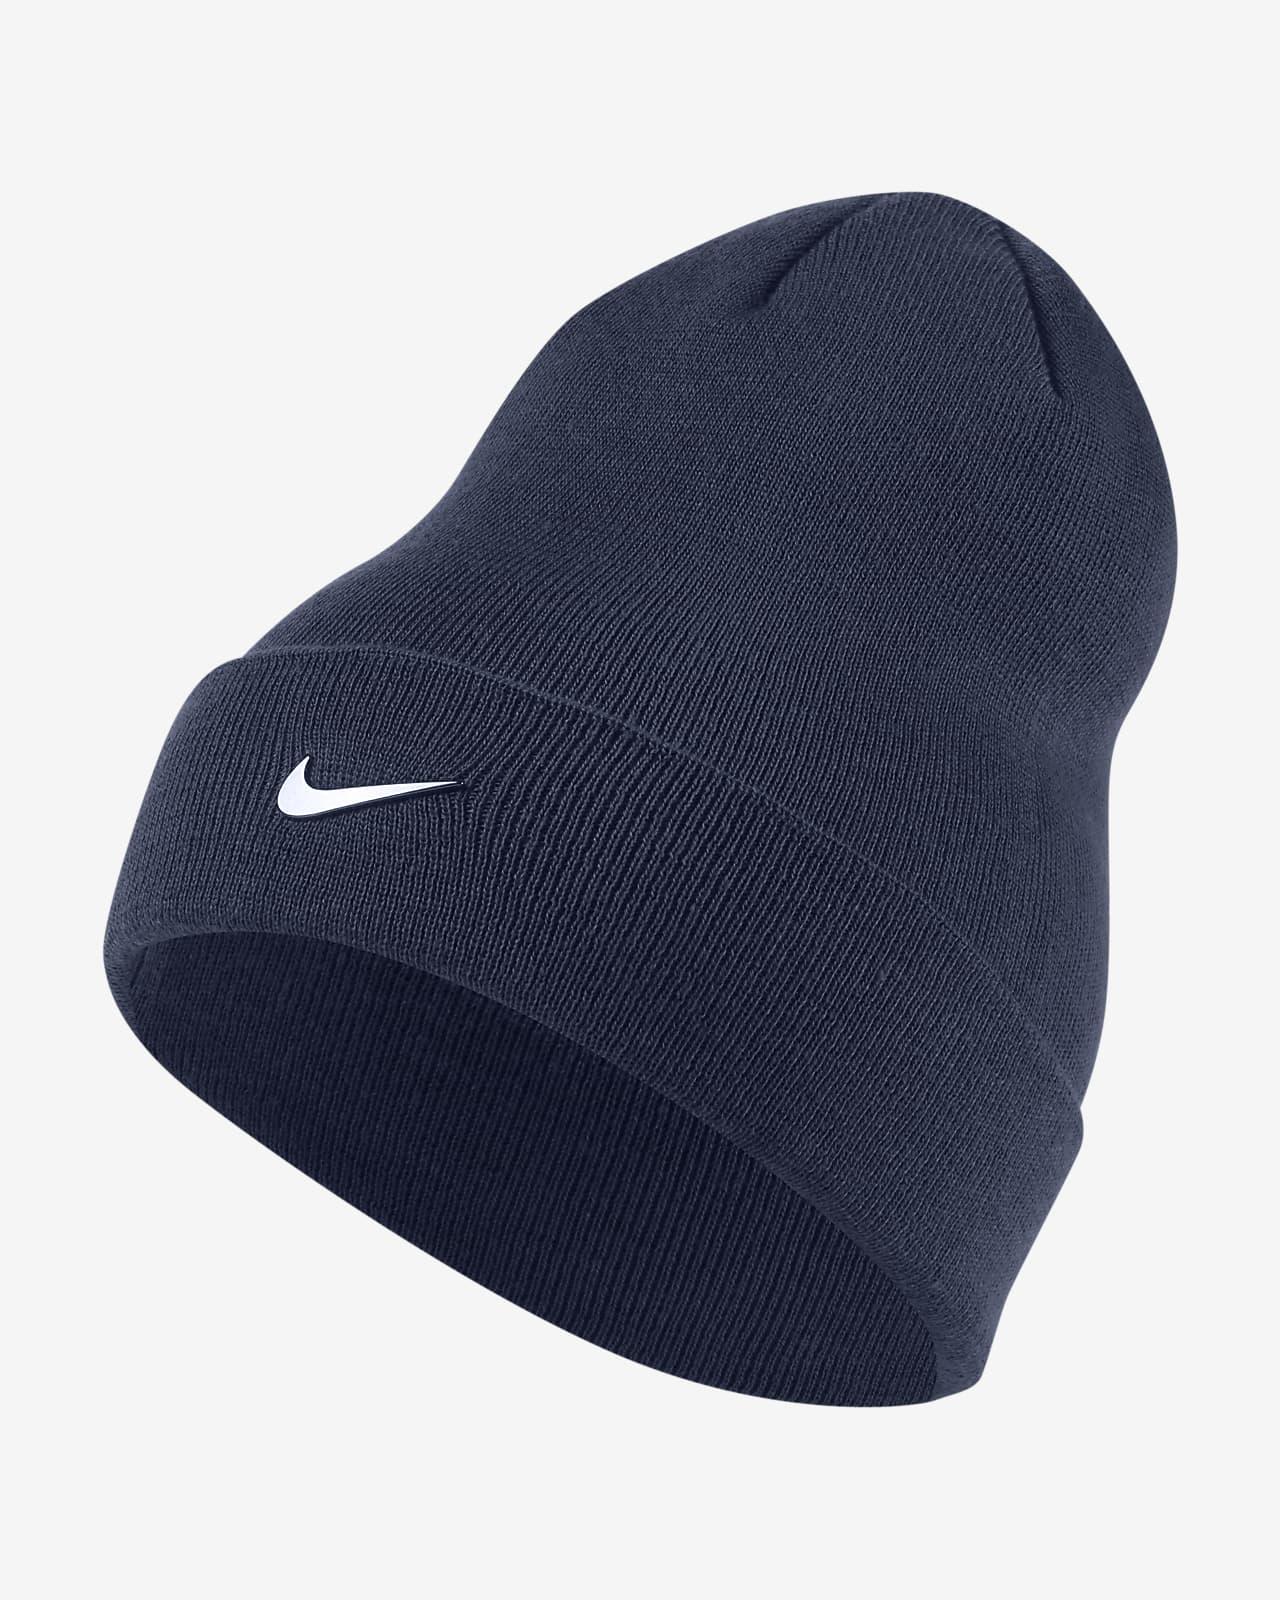 Berretto Nike - Bambini